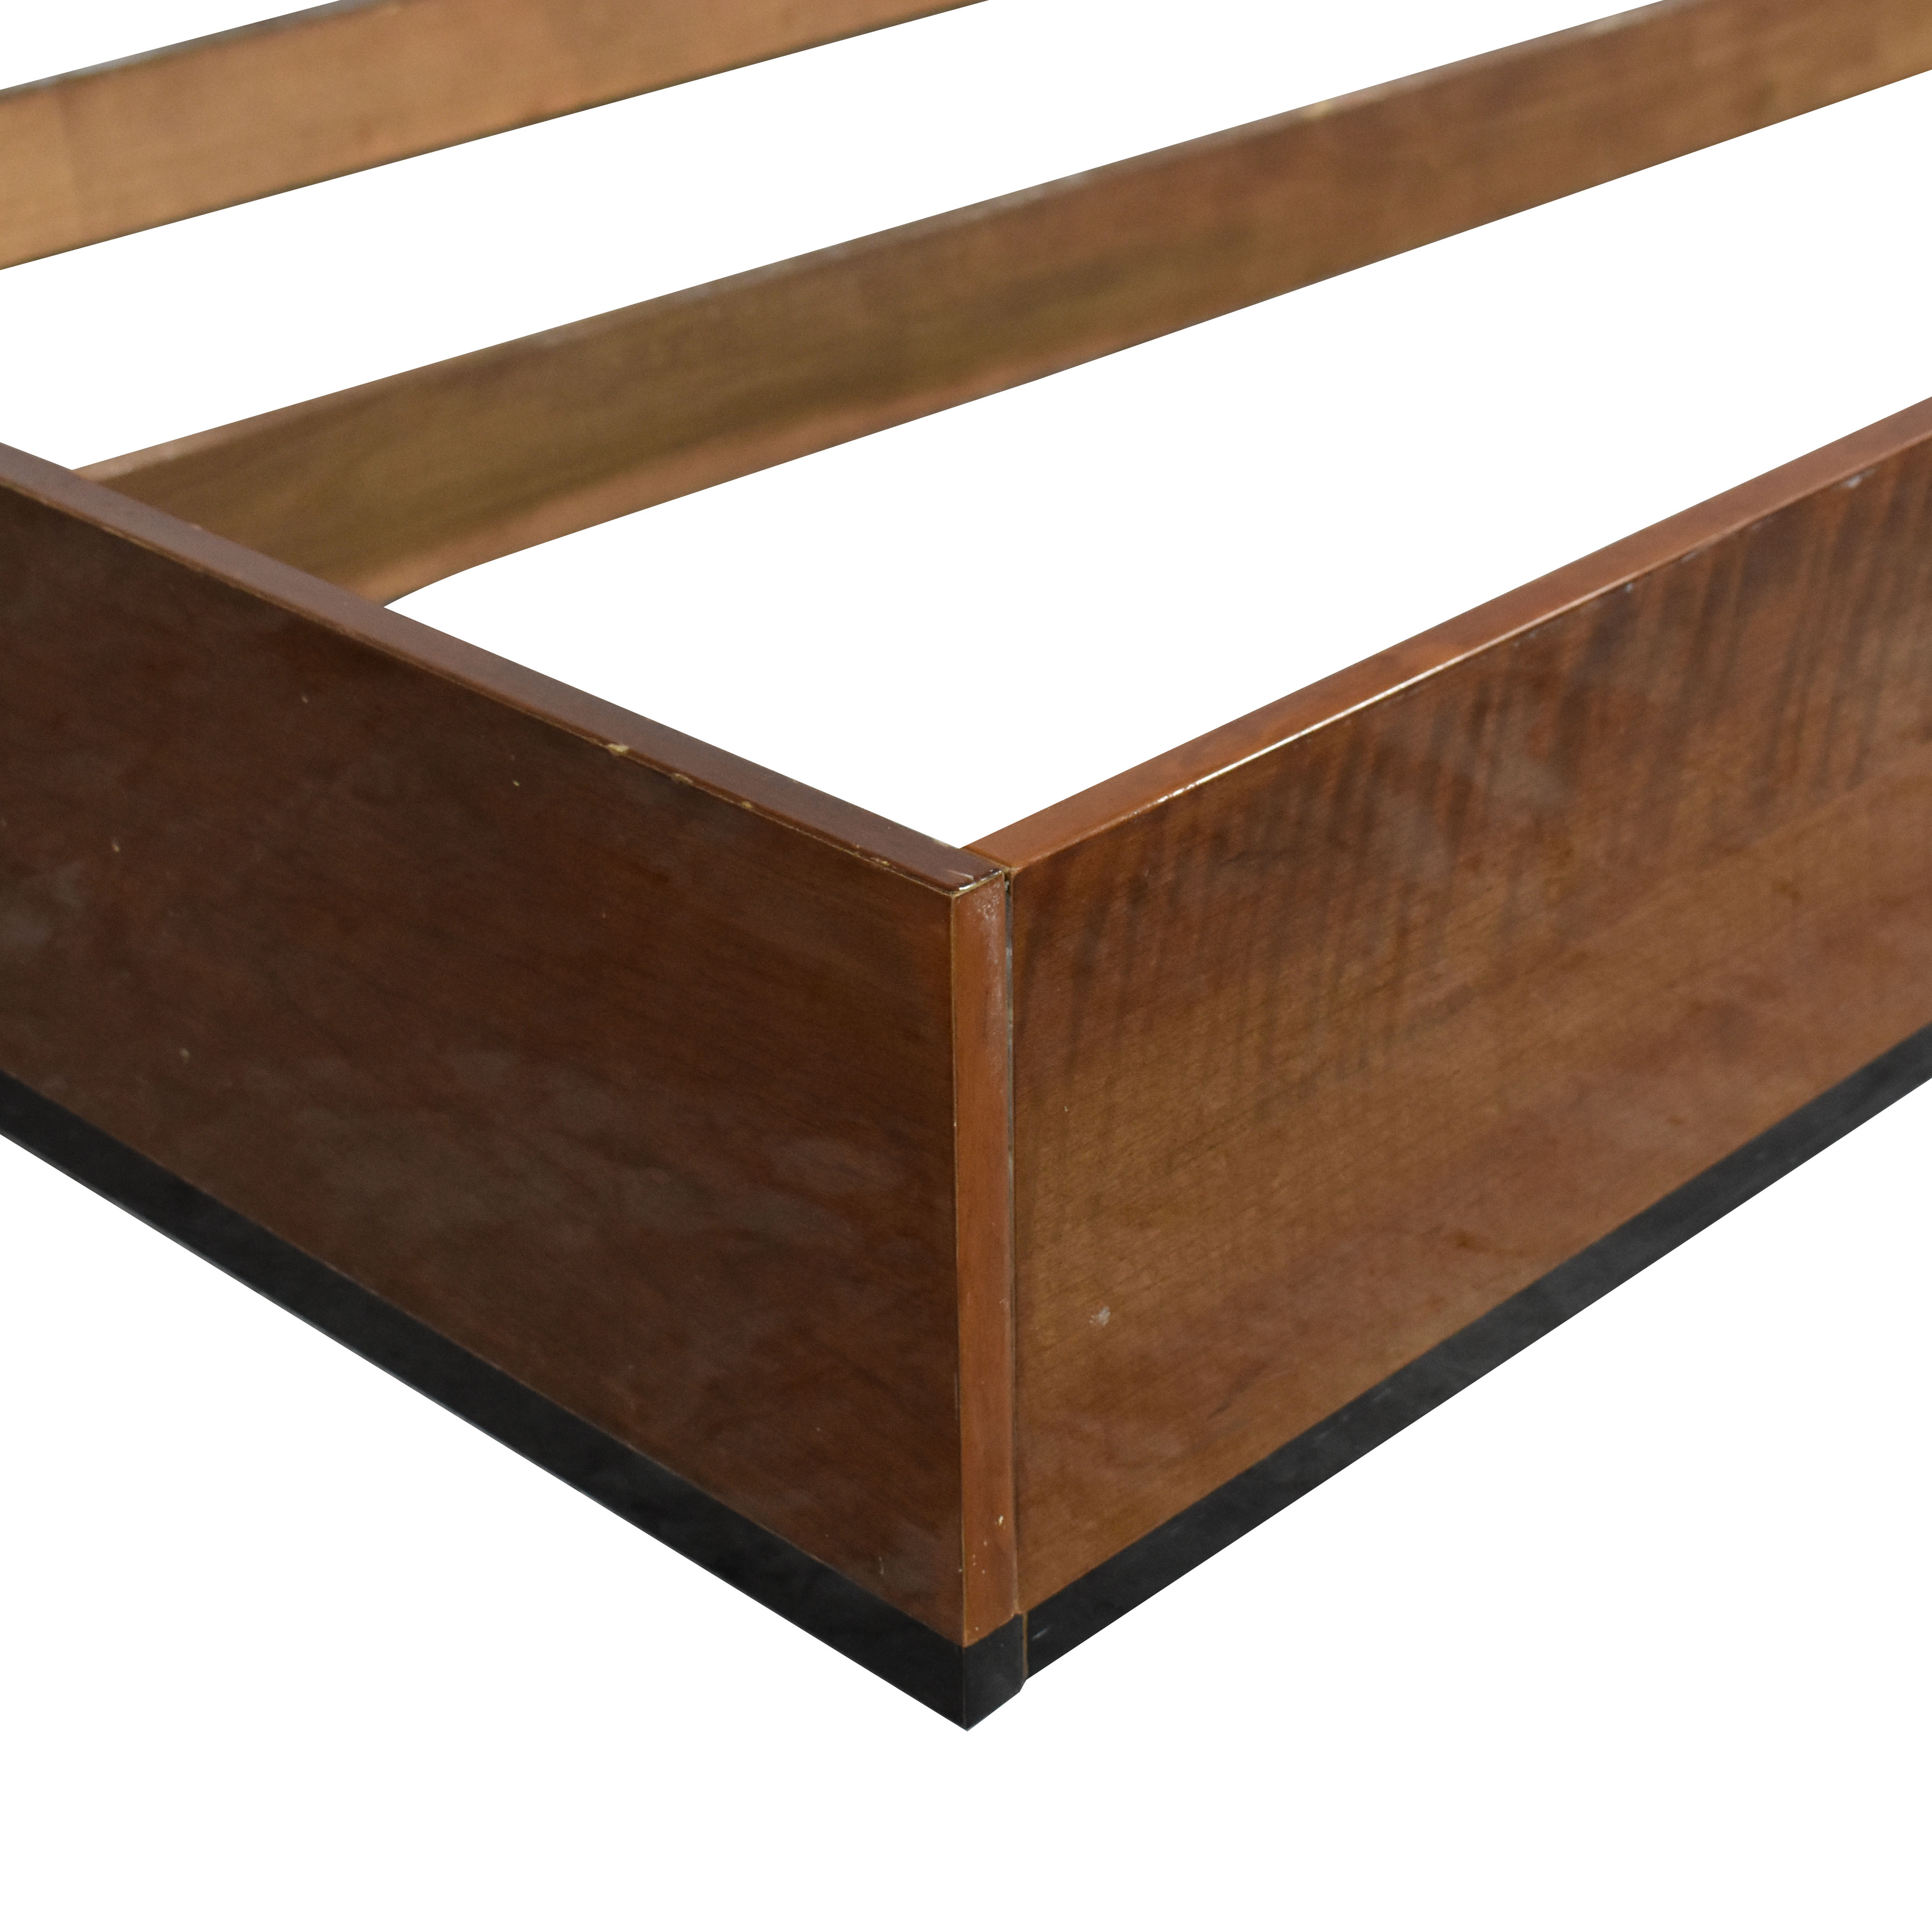 Henredon Furniture Henredon Furniture King Storage Bed with Nightstands for sale